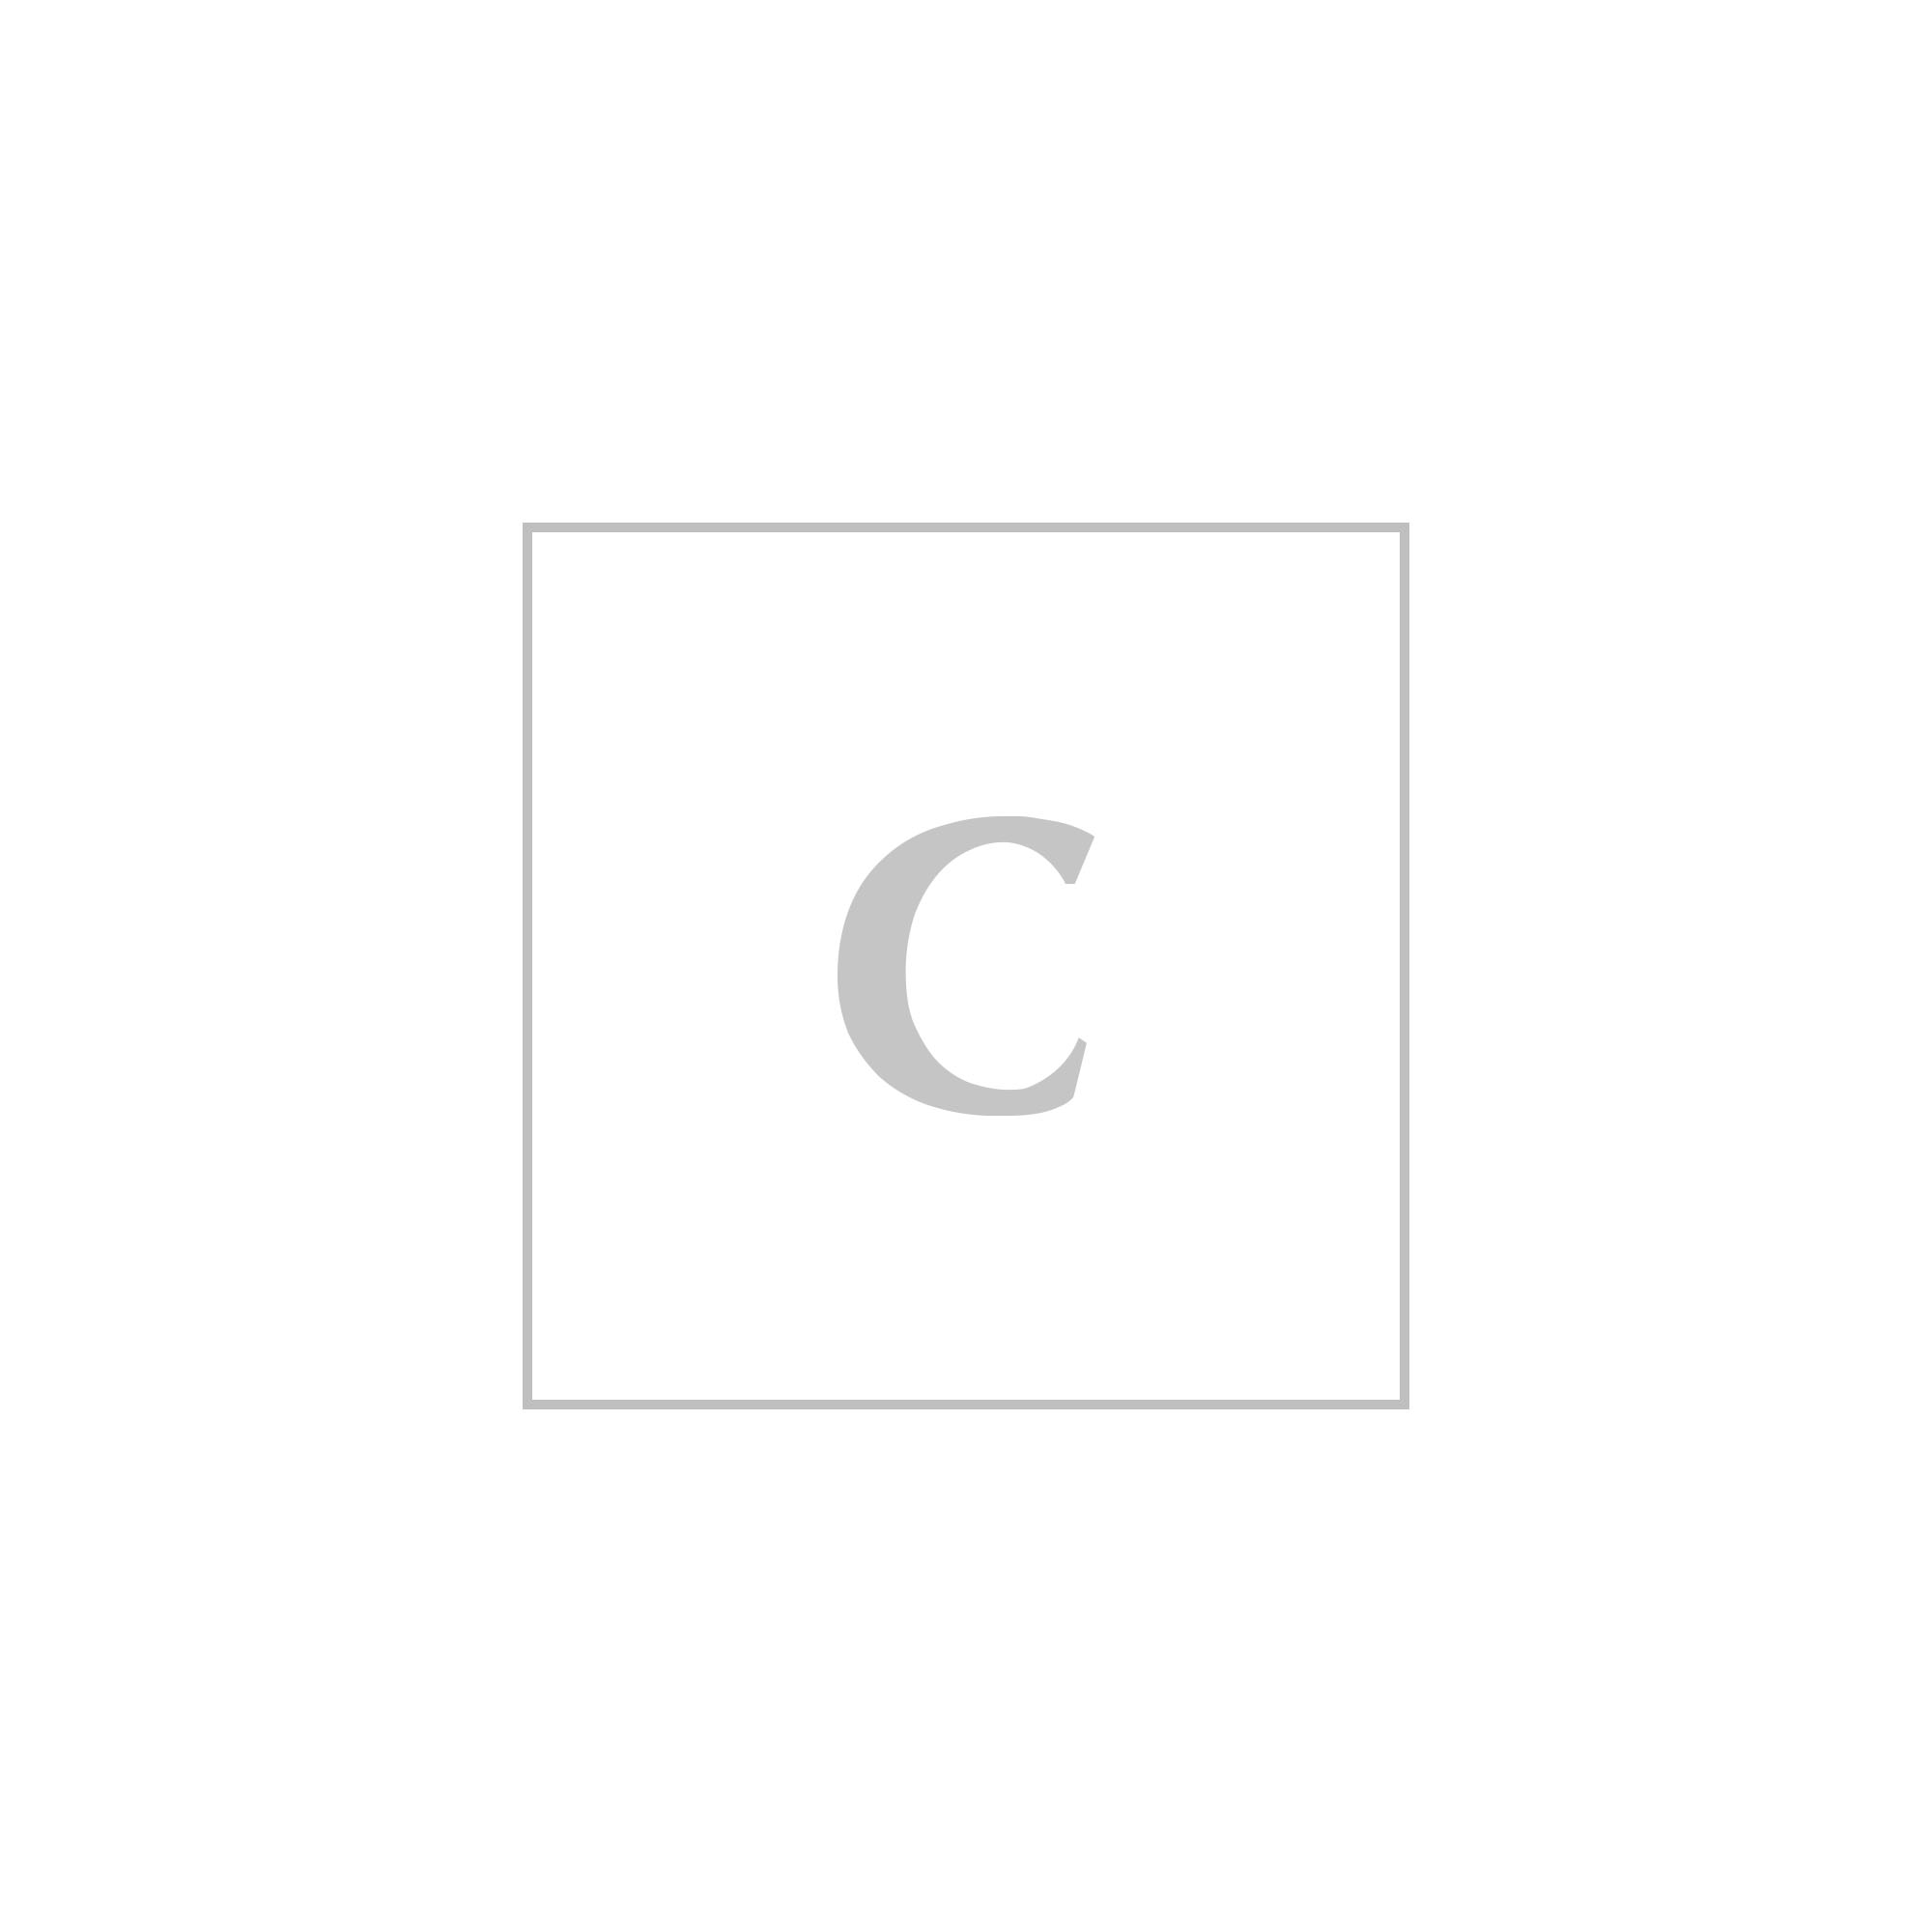 https://www.coltortiboutique.com/media/catalog/product/cache/926507dc7f93631a094422215b778fe0/s/k/skirts_miu-miu_blu_192151dgn000002-f0013-4.jpg